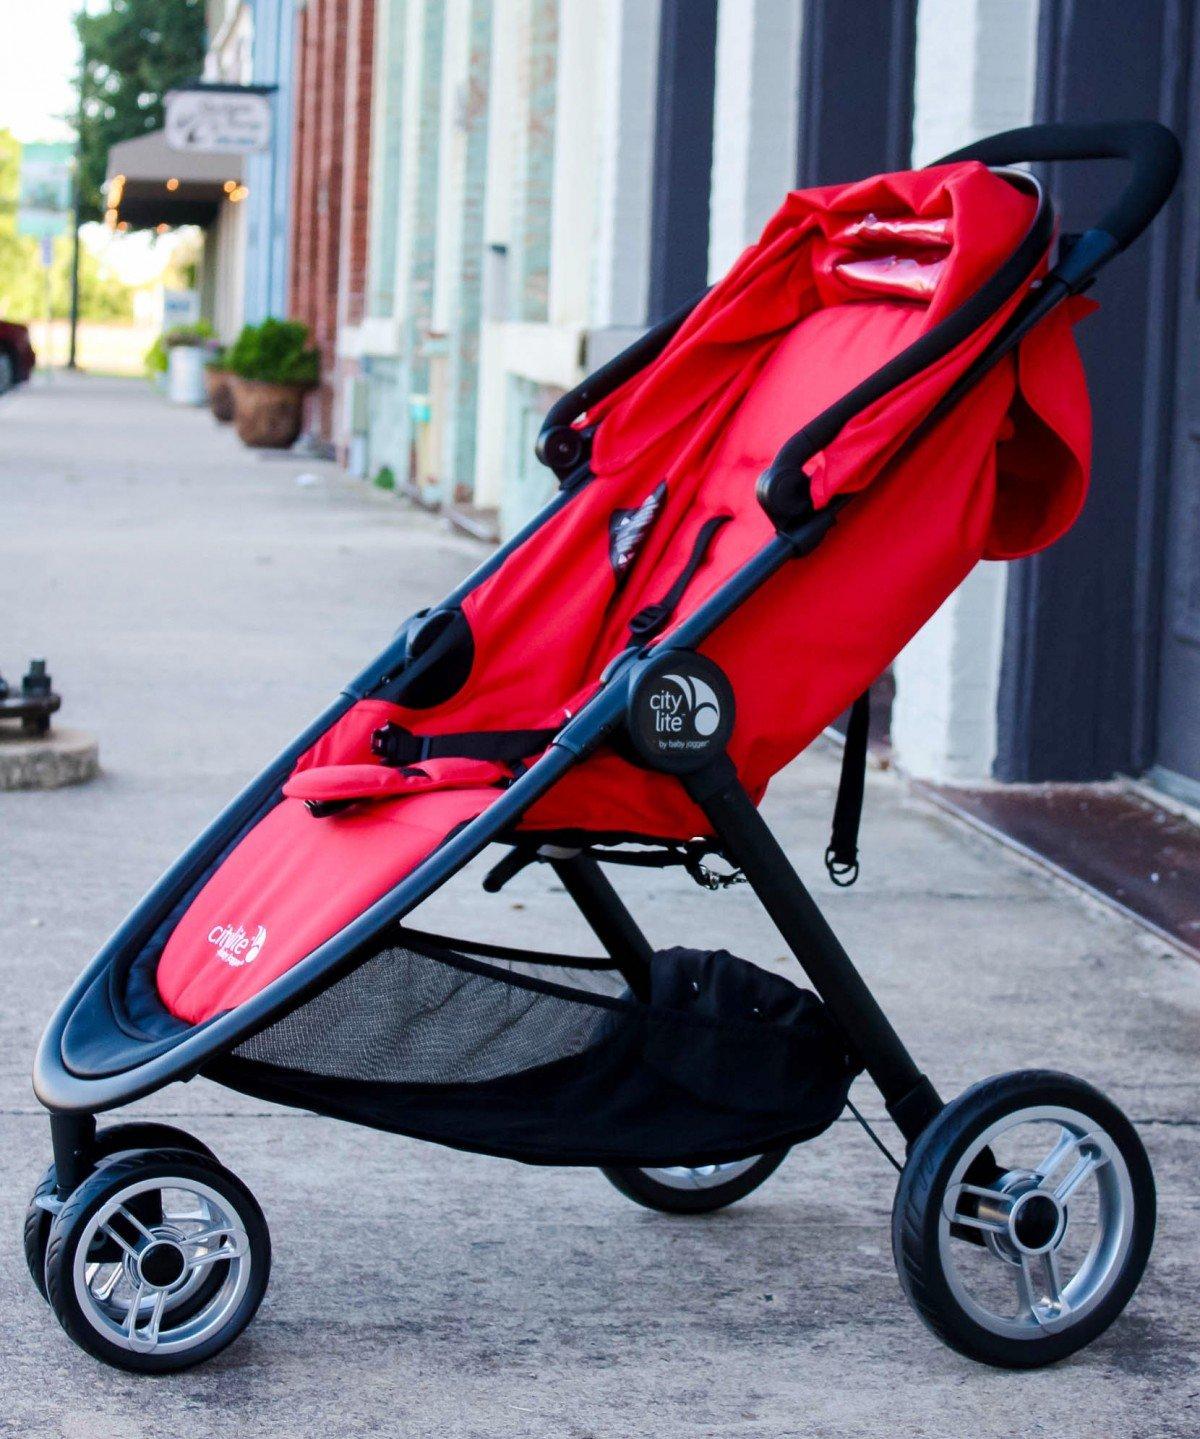 City Lite Stroller2